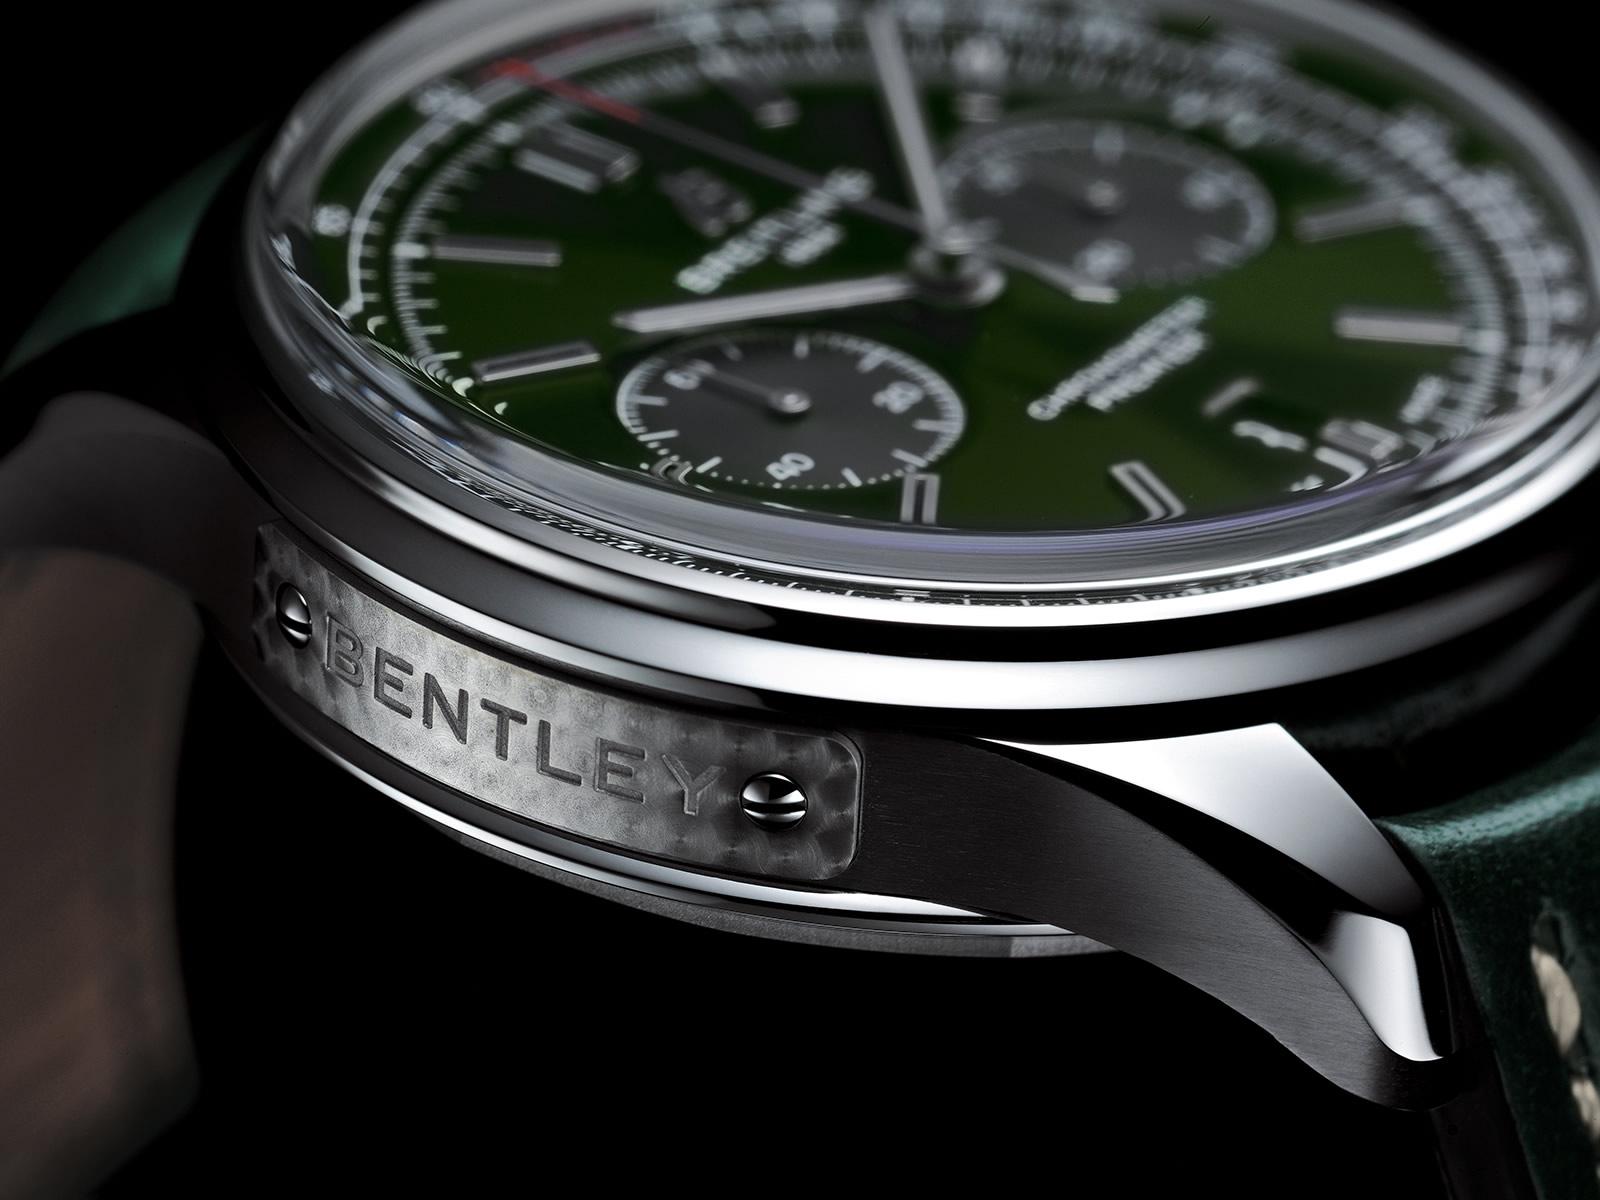 breitling-premier-b01-chronograph-42-bentley-british-racing-green-with-a-british-racing-green-leather-strap-5-.jpg